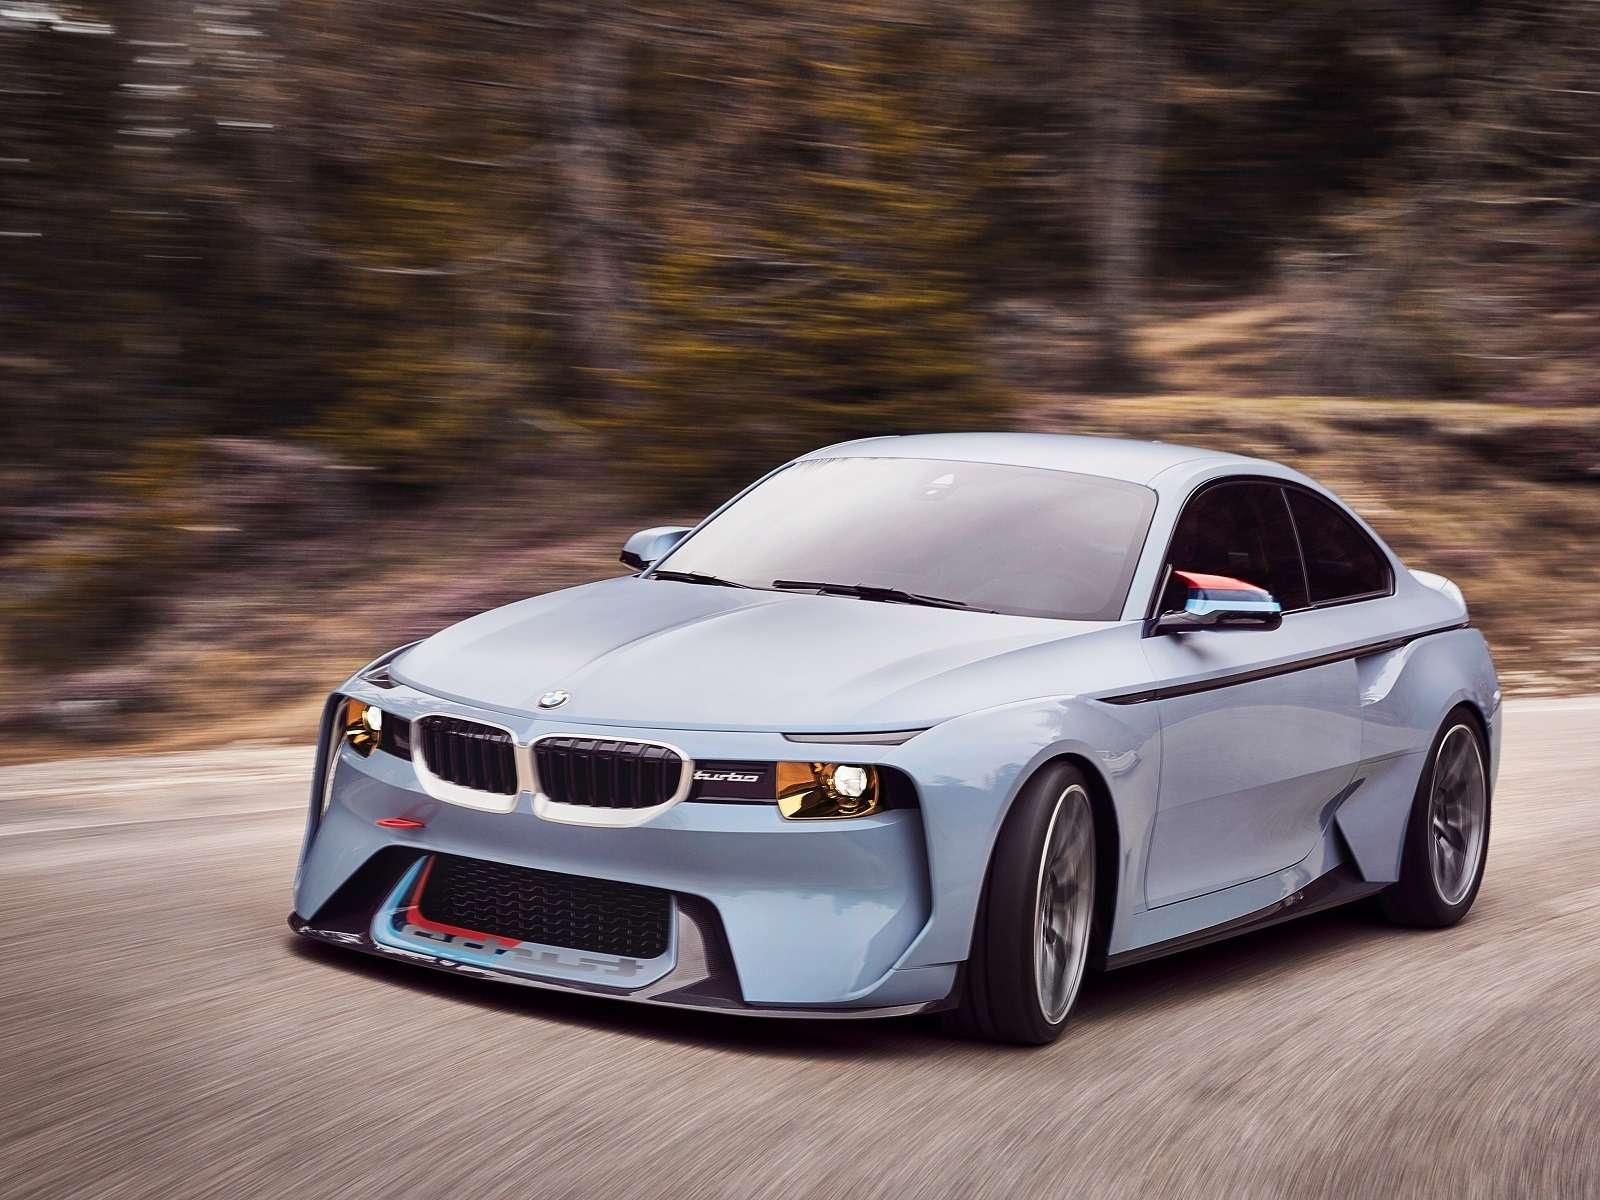 Иллюзия легенды: BMW поупражнялась натему 2002 turbo— фото 590510